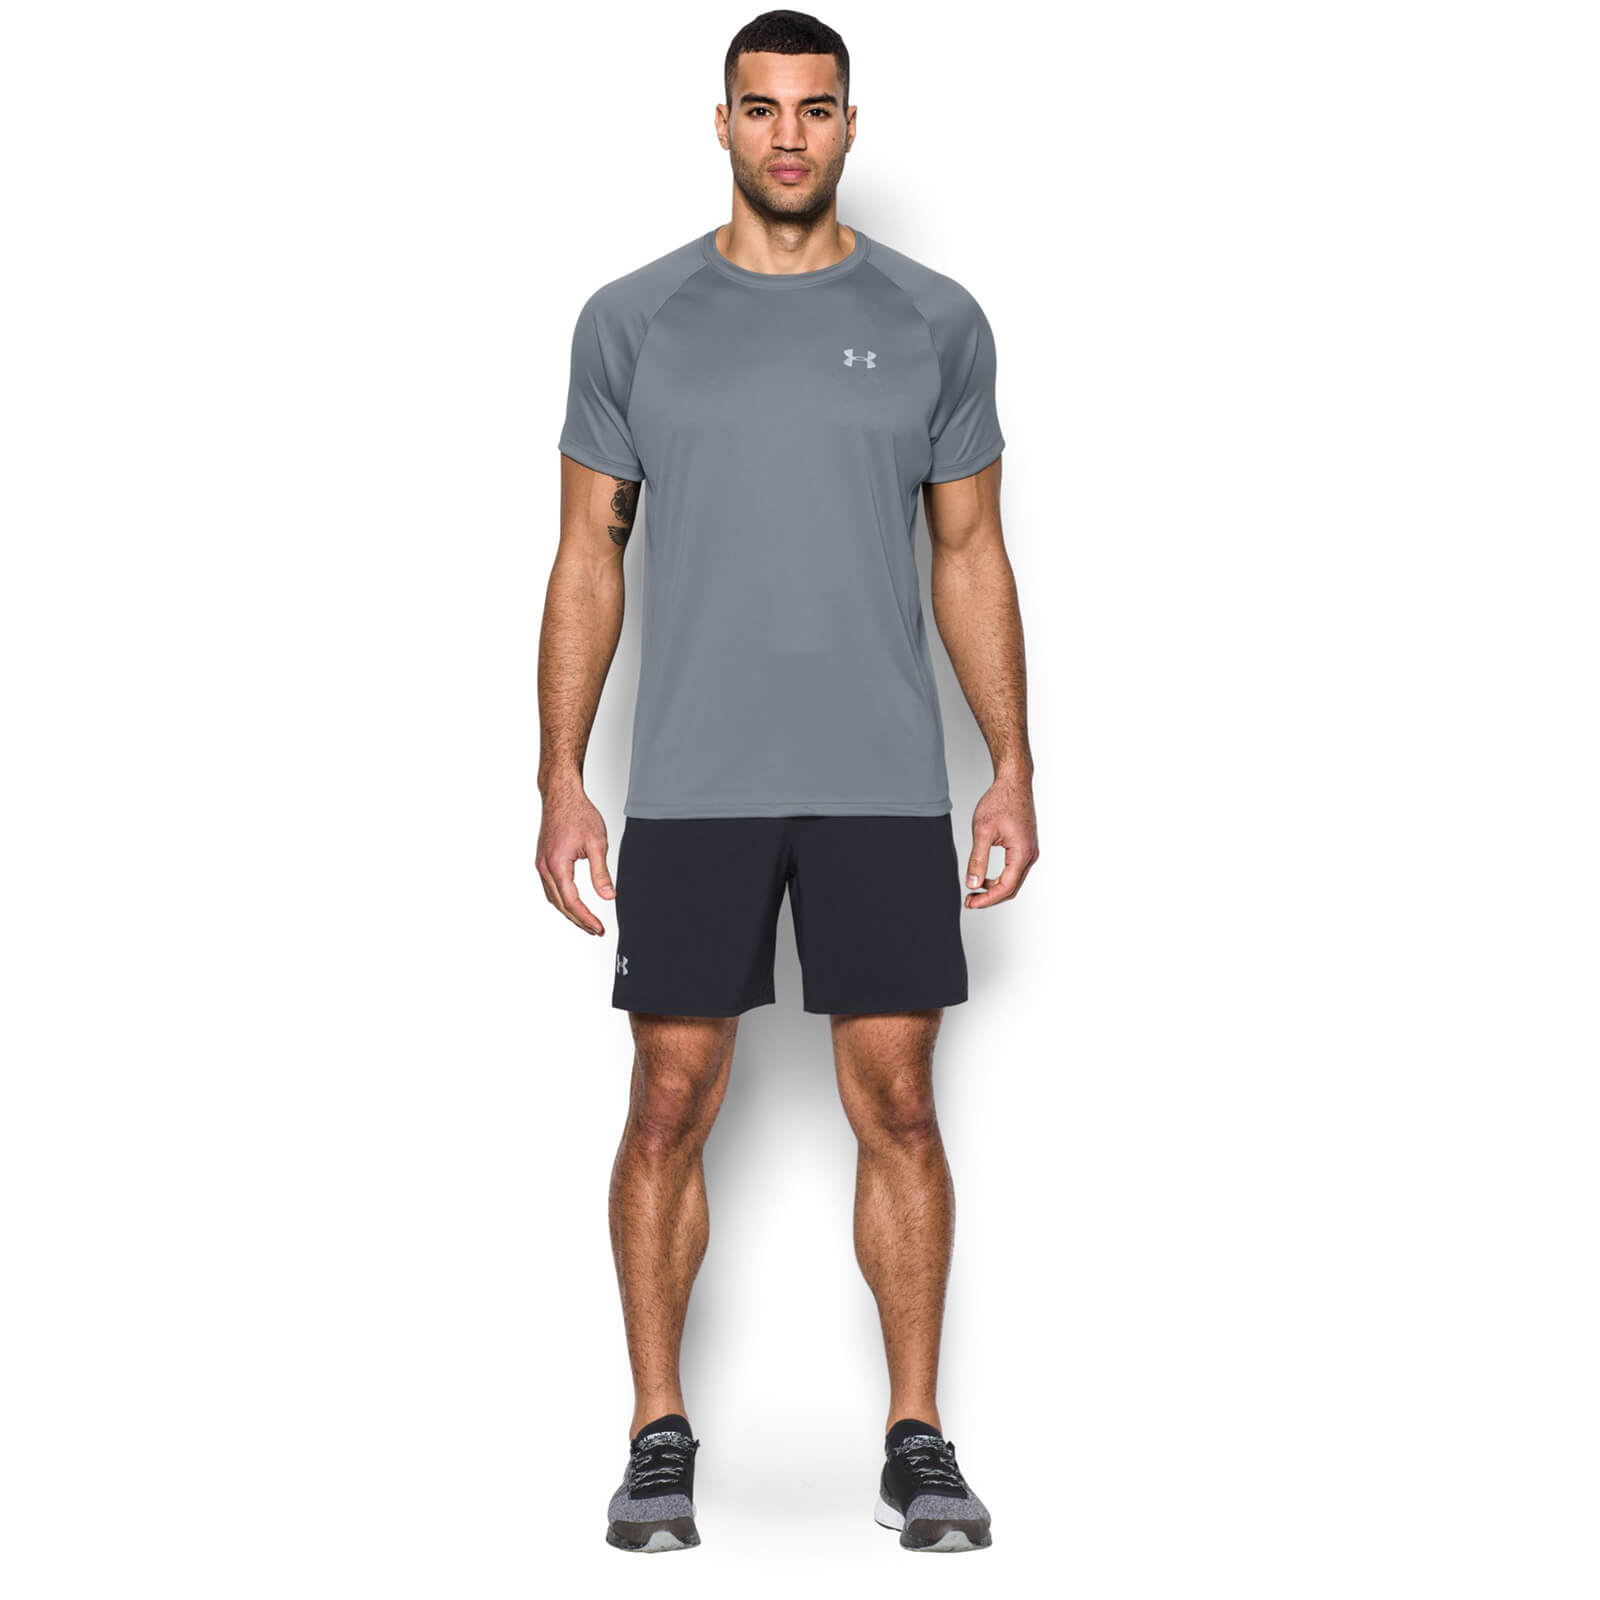 b5d27415 Under Armour Men's Speed Stride Run T-Shirt - Steel Sports & Leisure |  TheHut.com